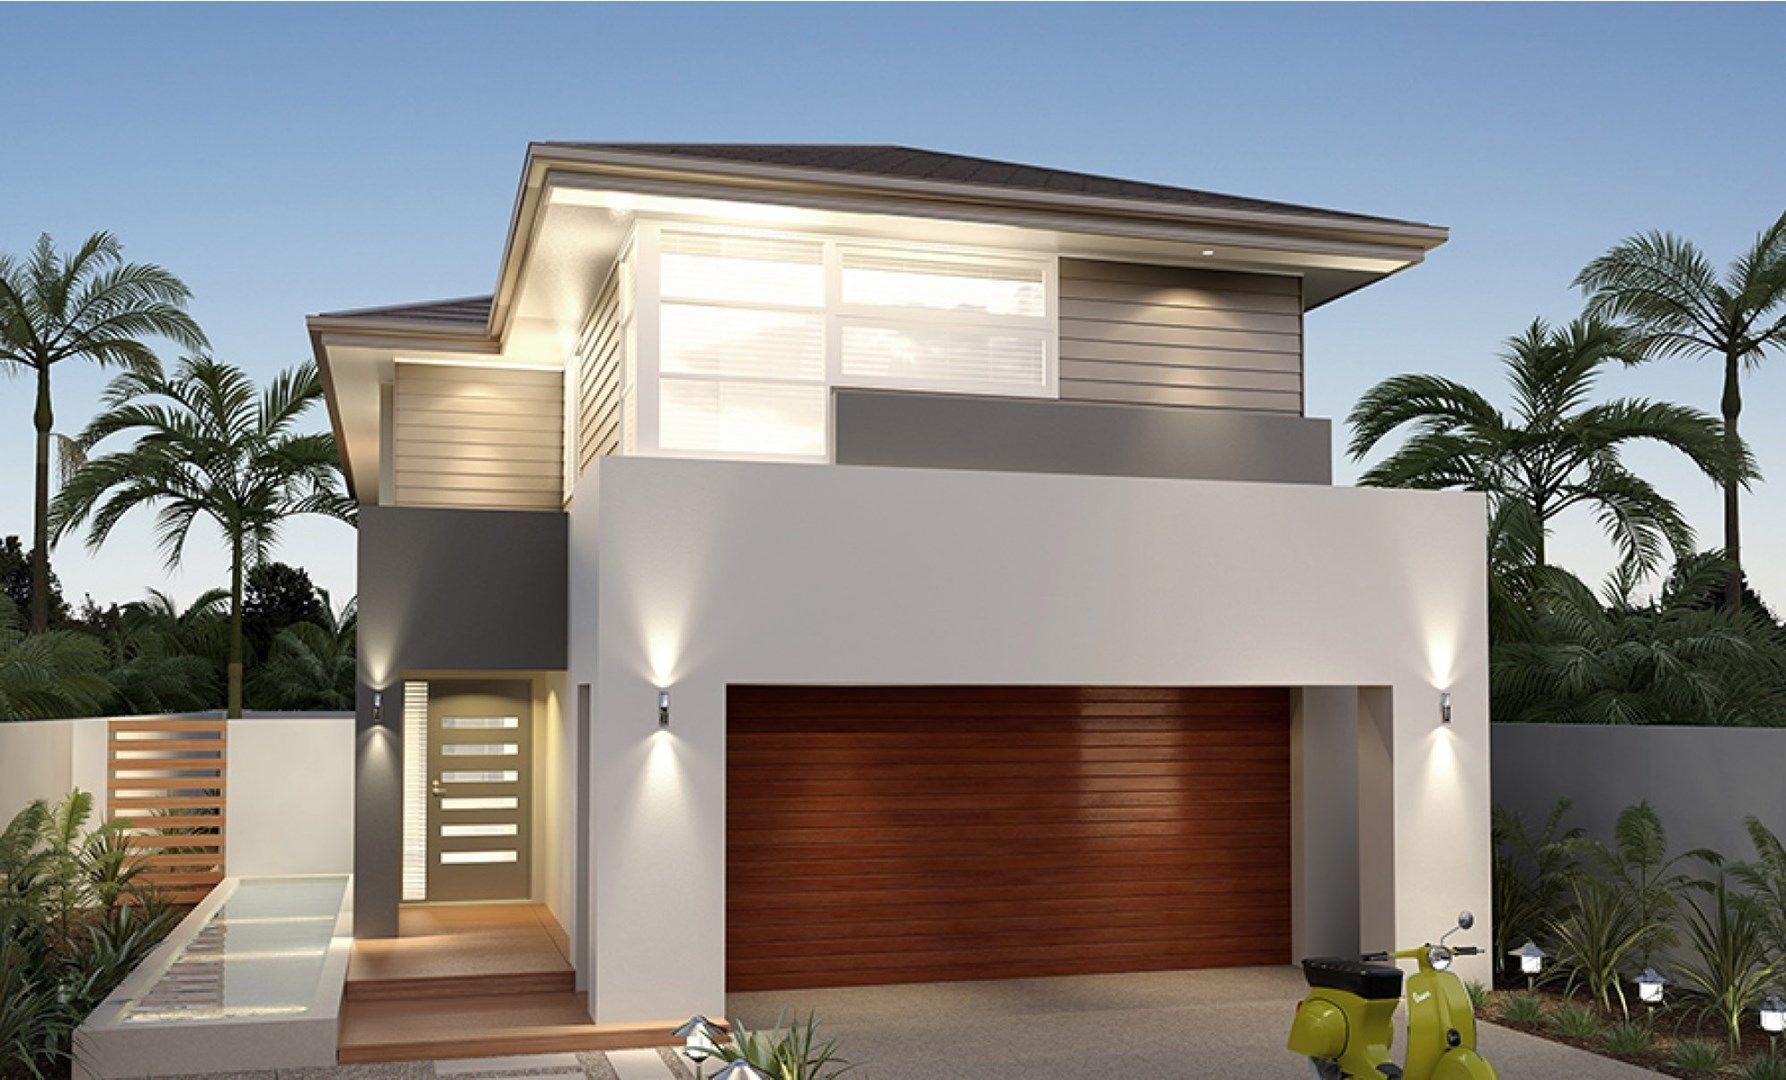 Lot 21 Phoenix Street, Rochedale QLD 4123, Image 0